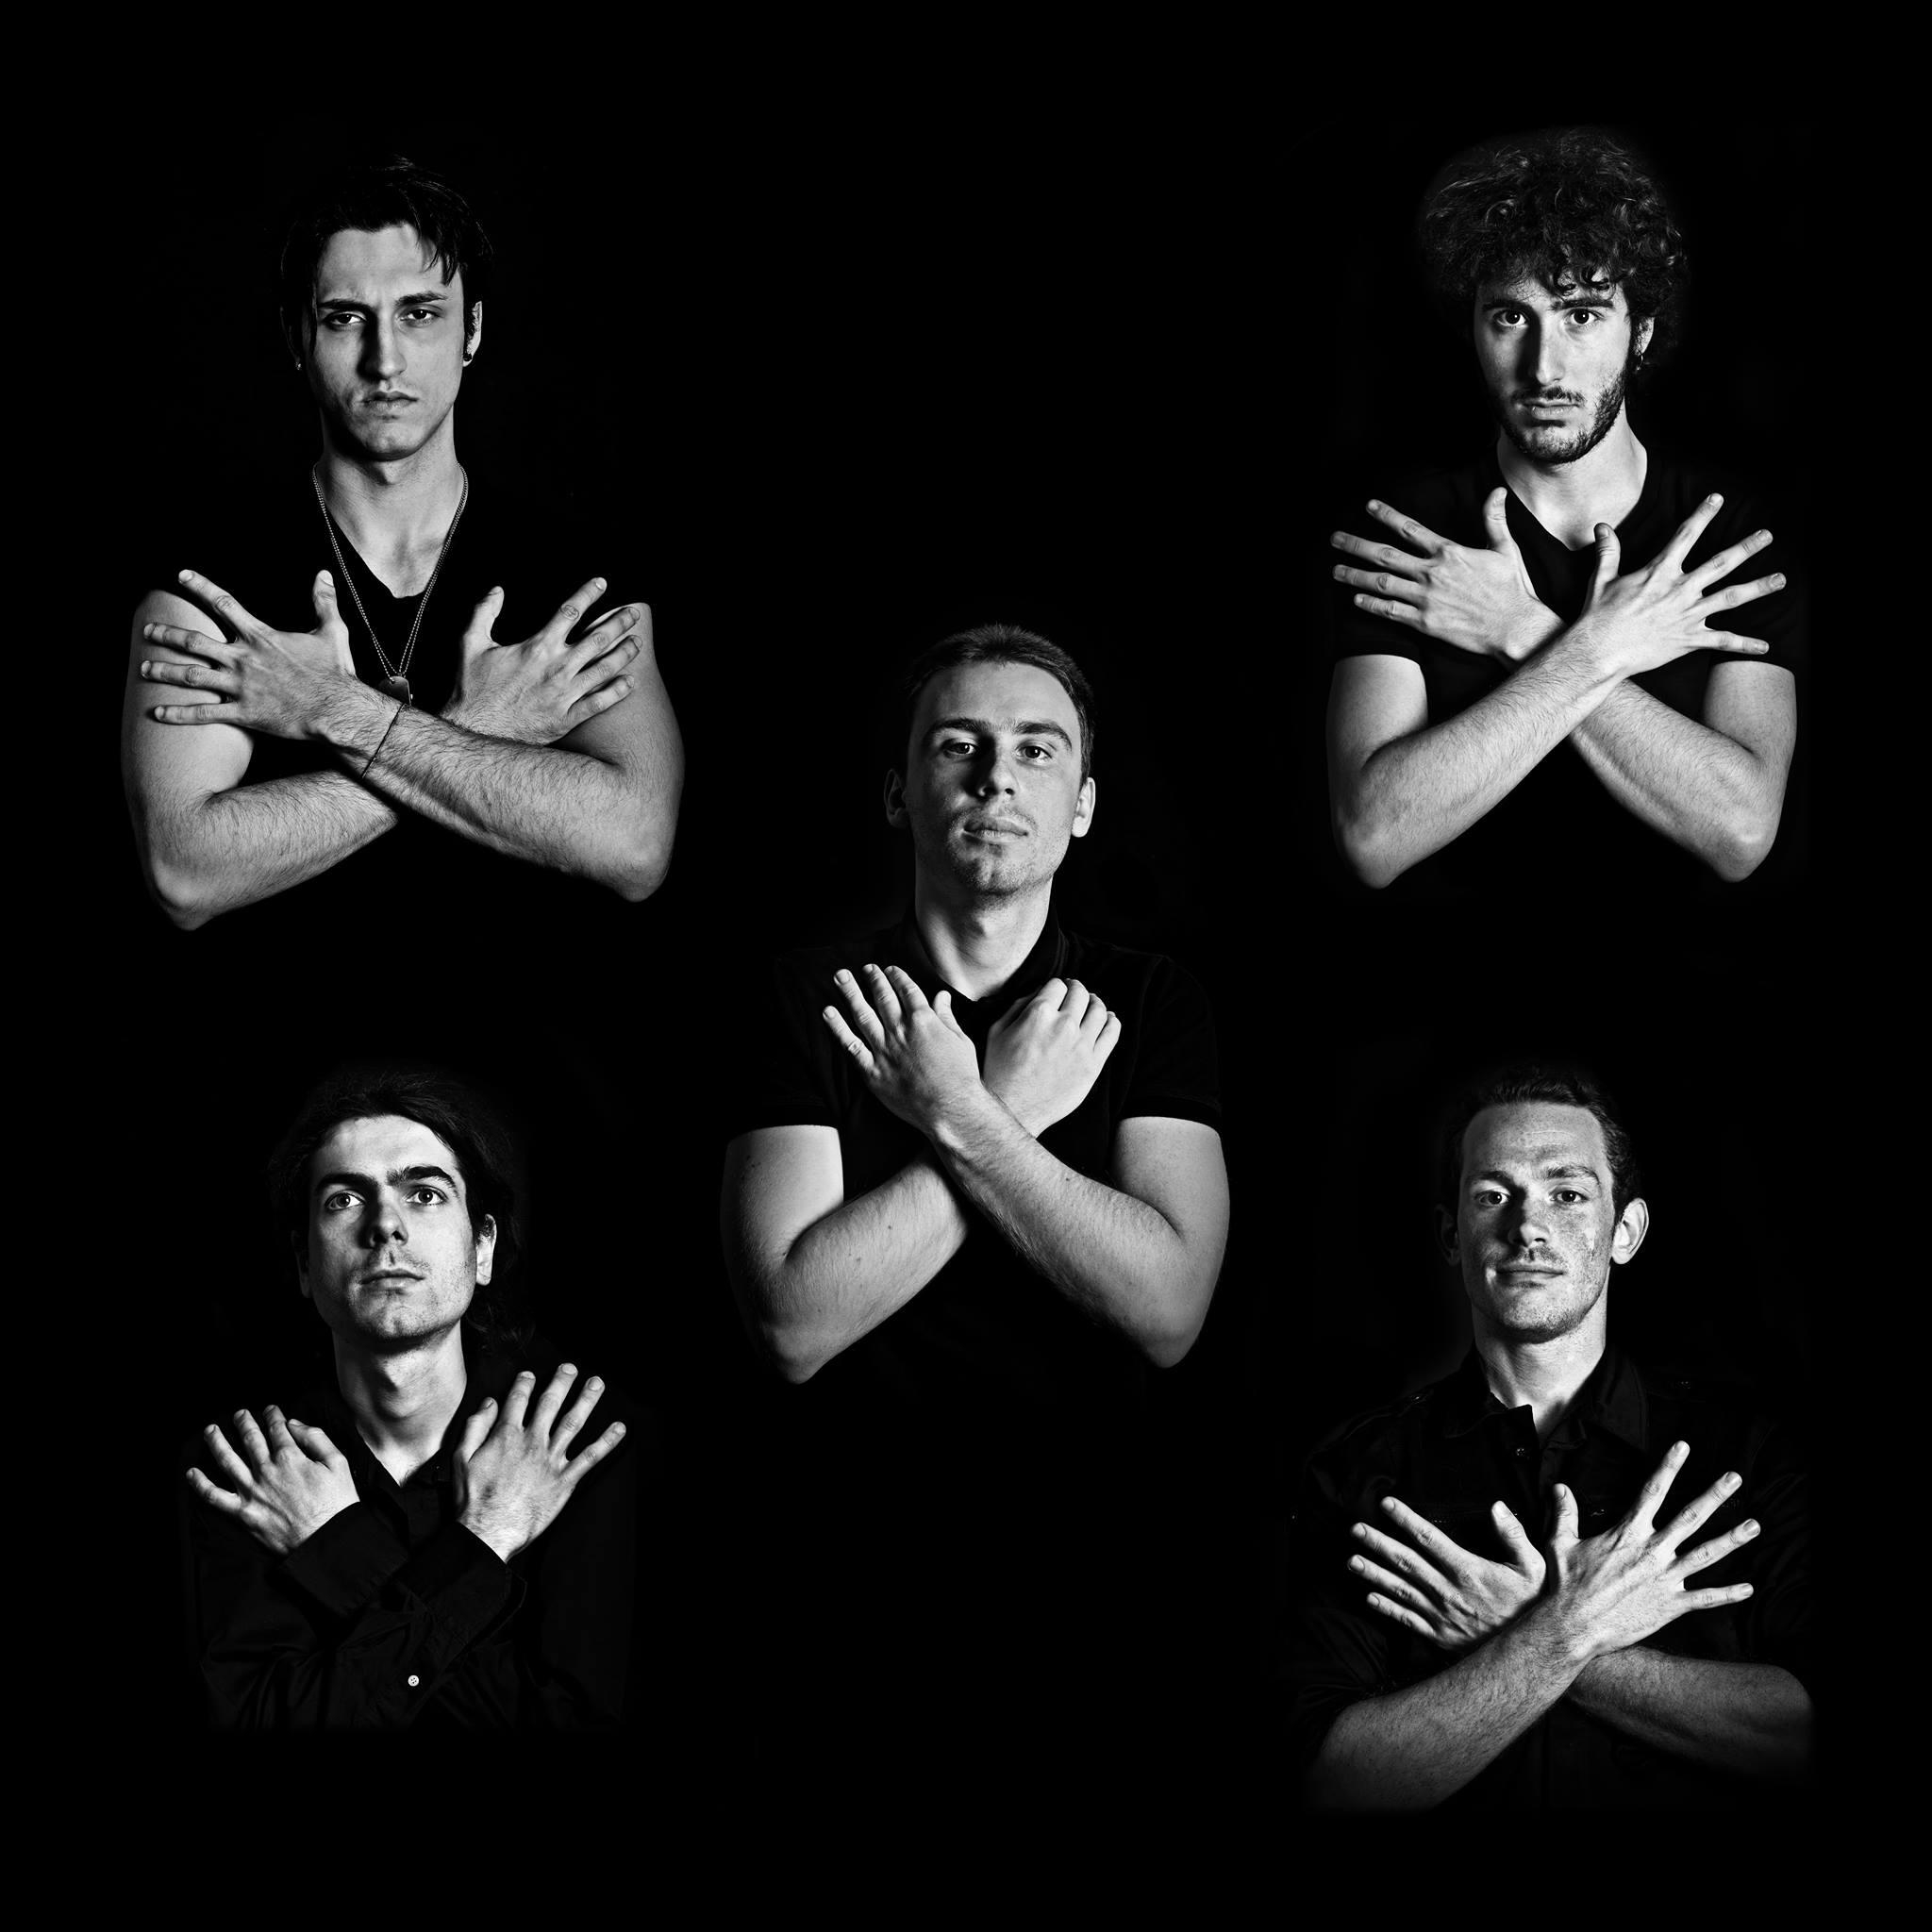 Foto per la band cyrax